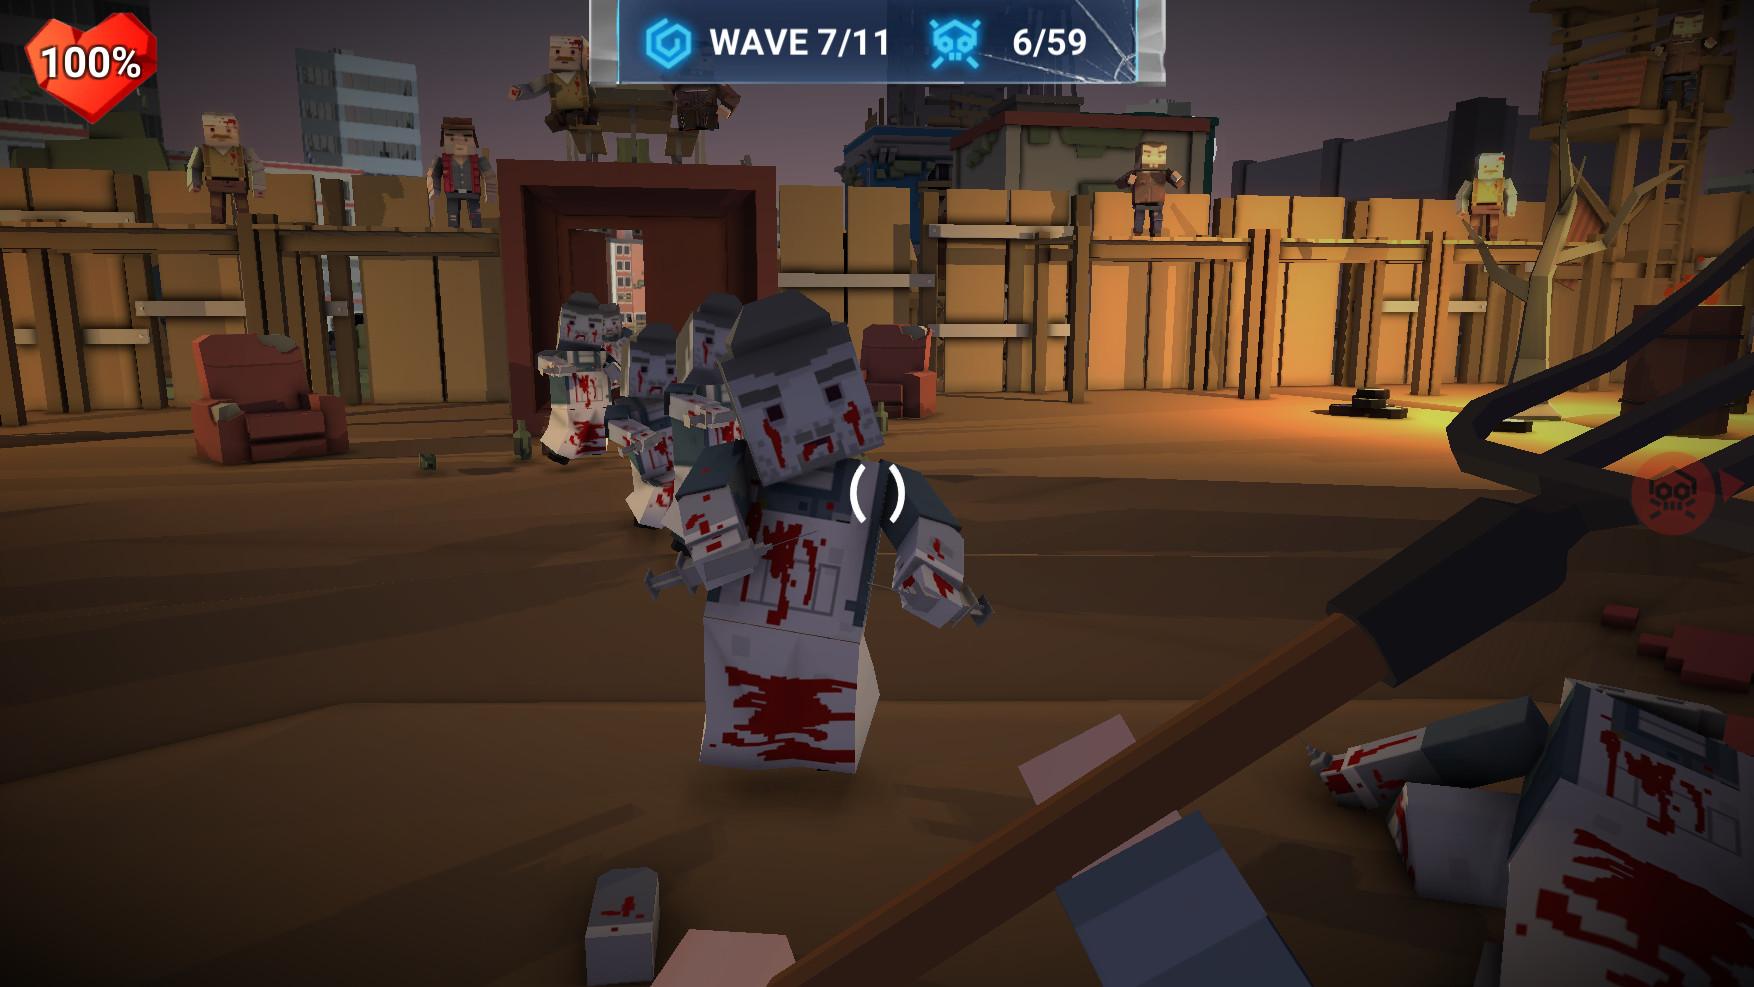 Скриншоты к The Walking Zombie: Dead City (2018/RUS) PC - полная версия на русском